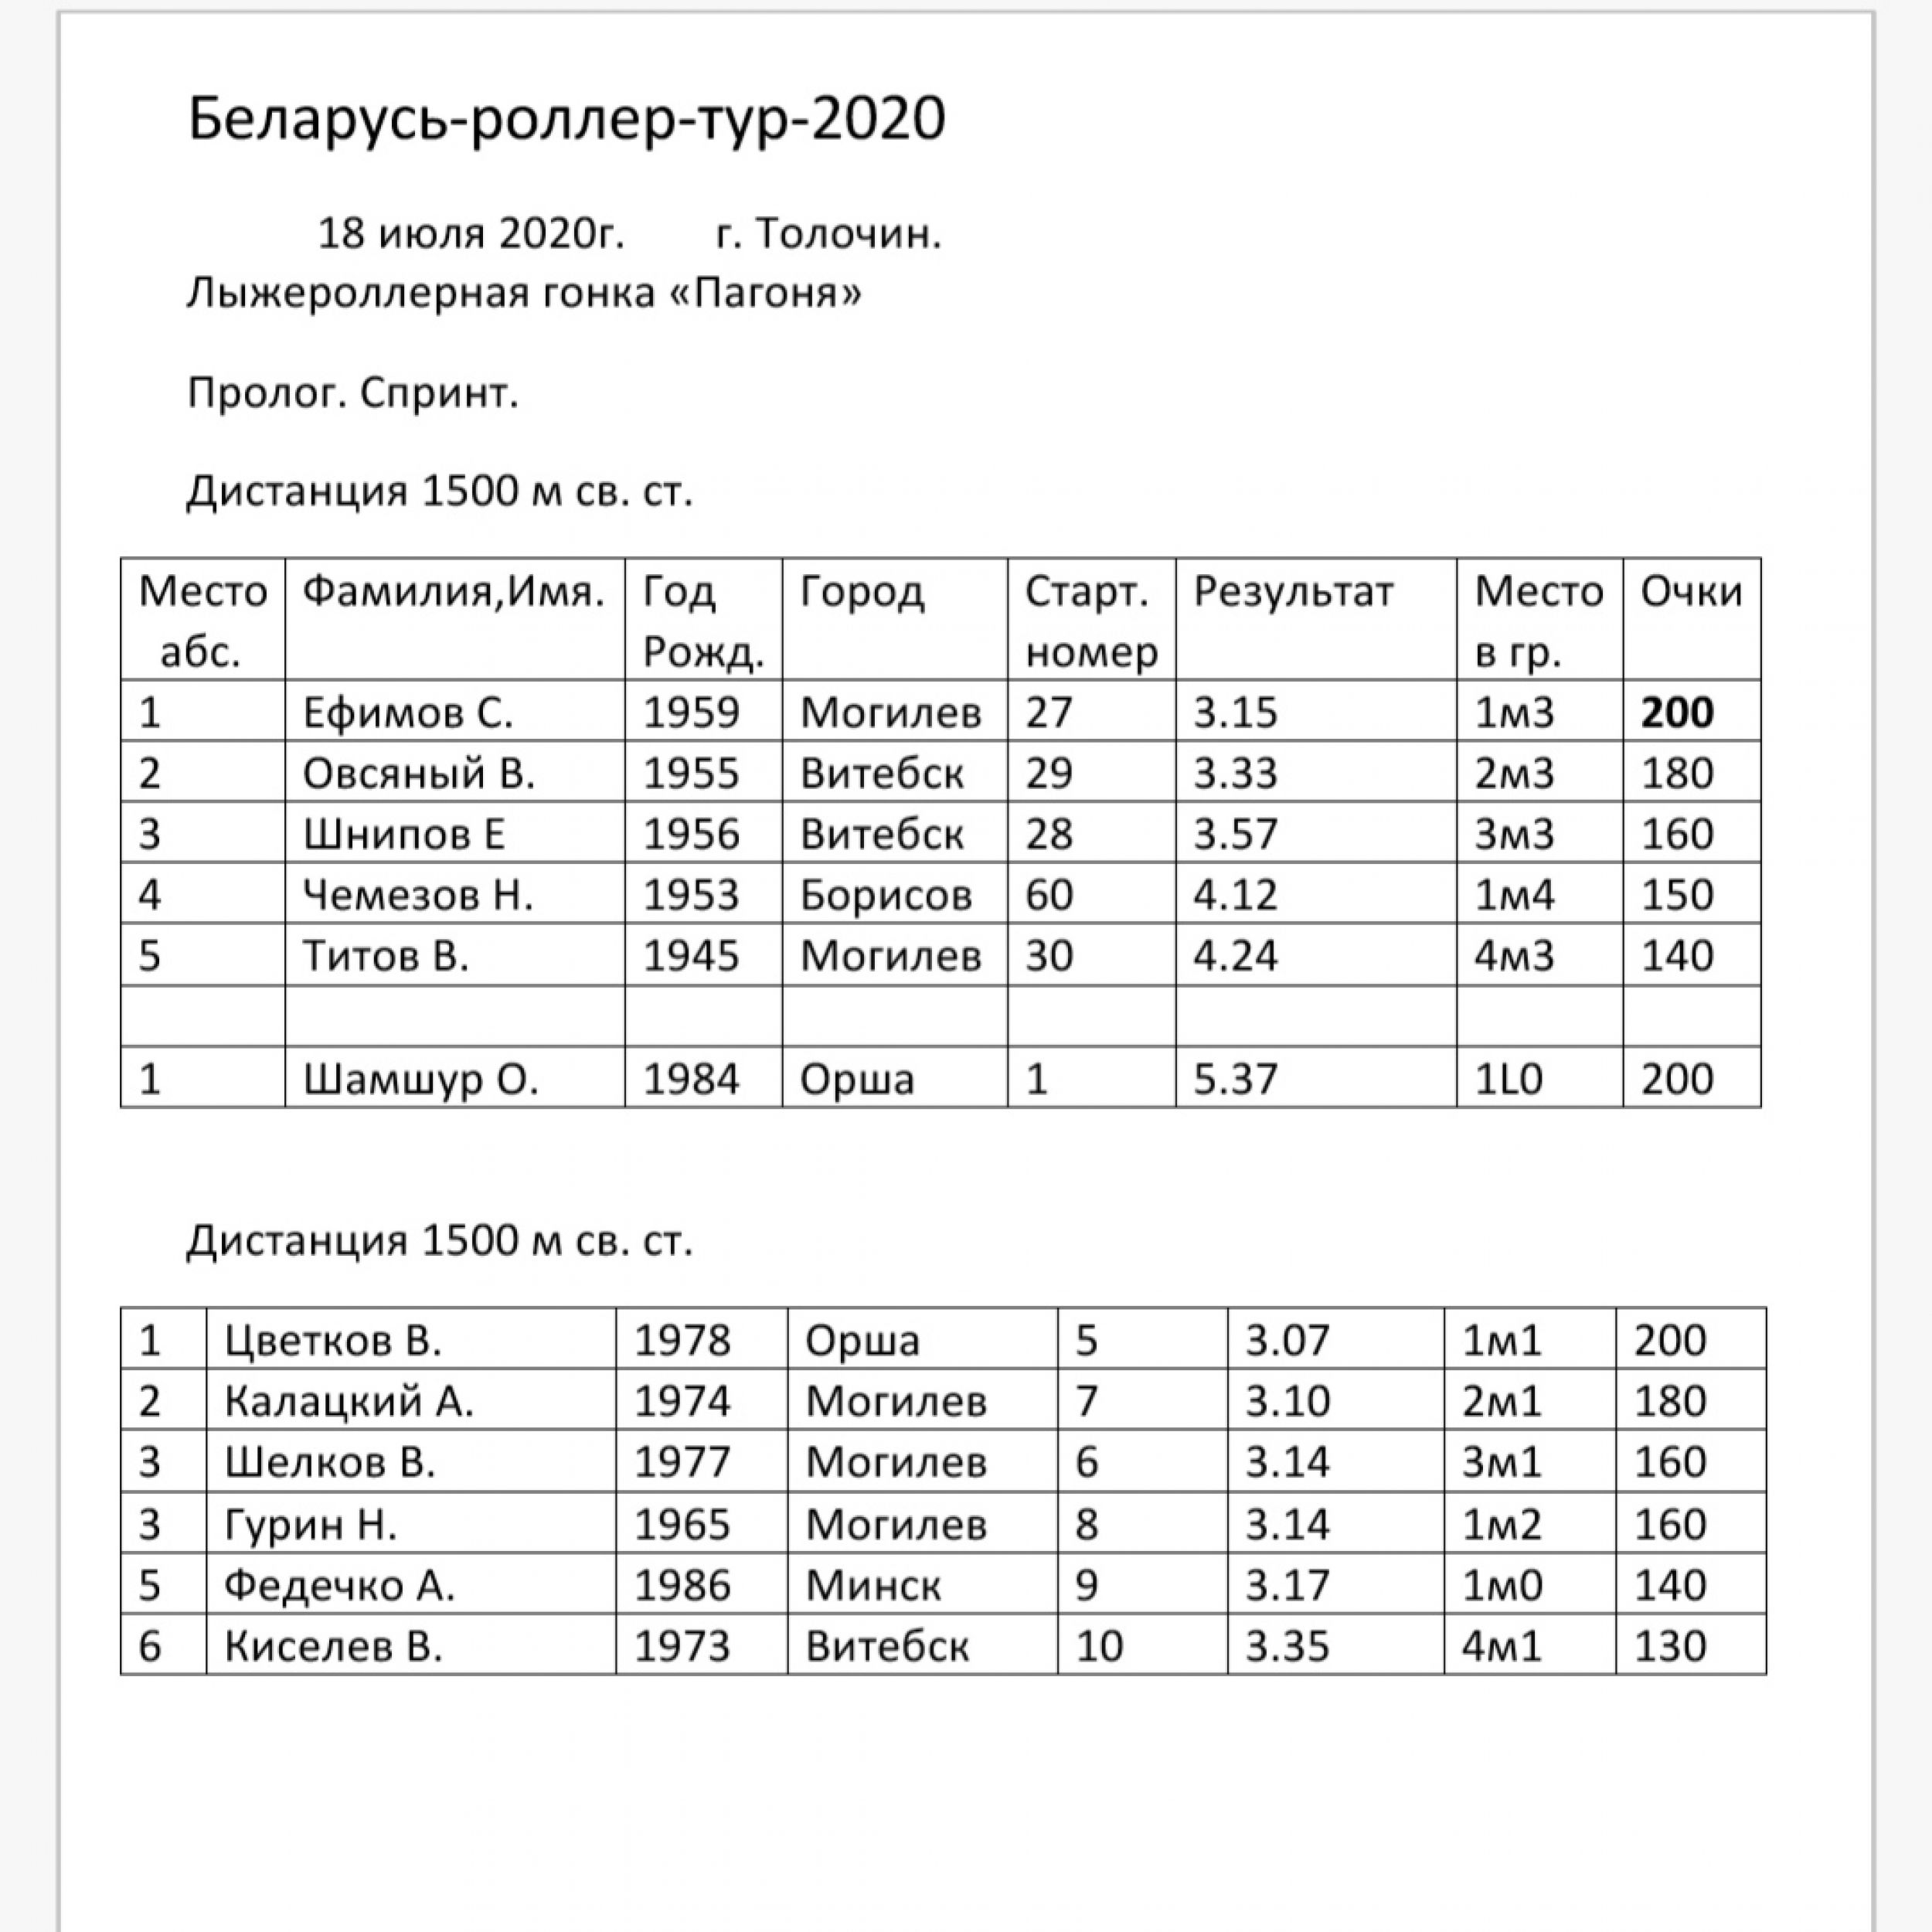 IMG_20200718_211212.jpg